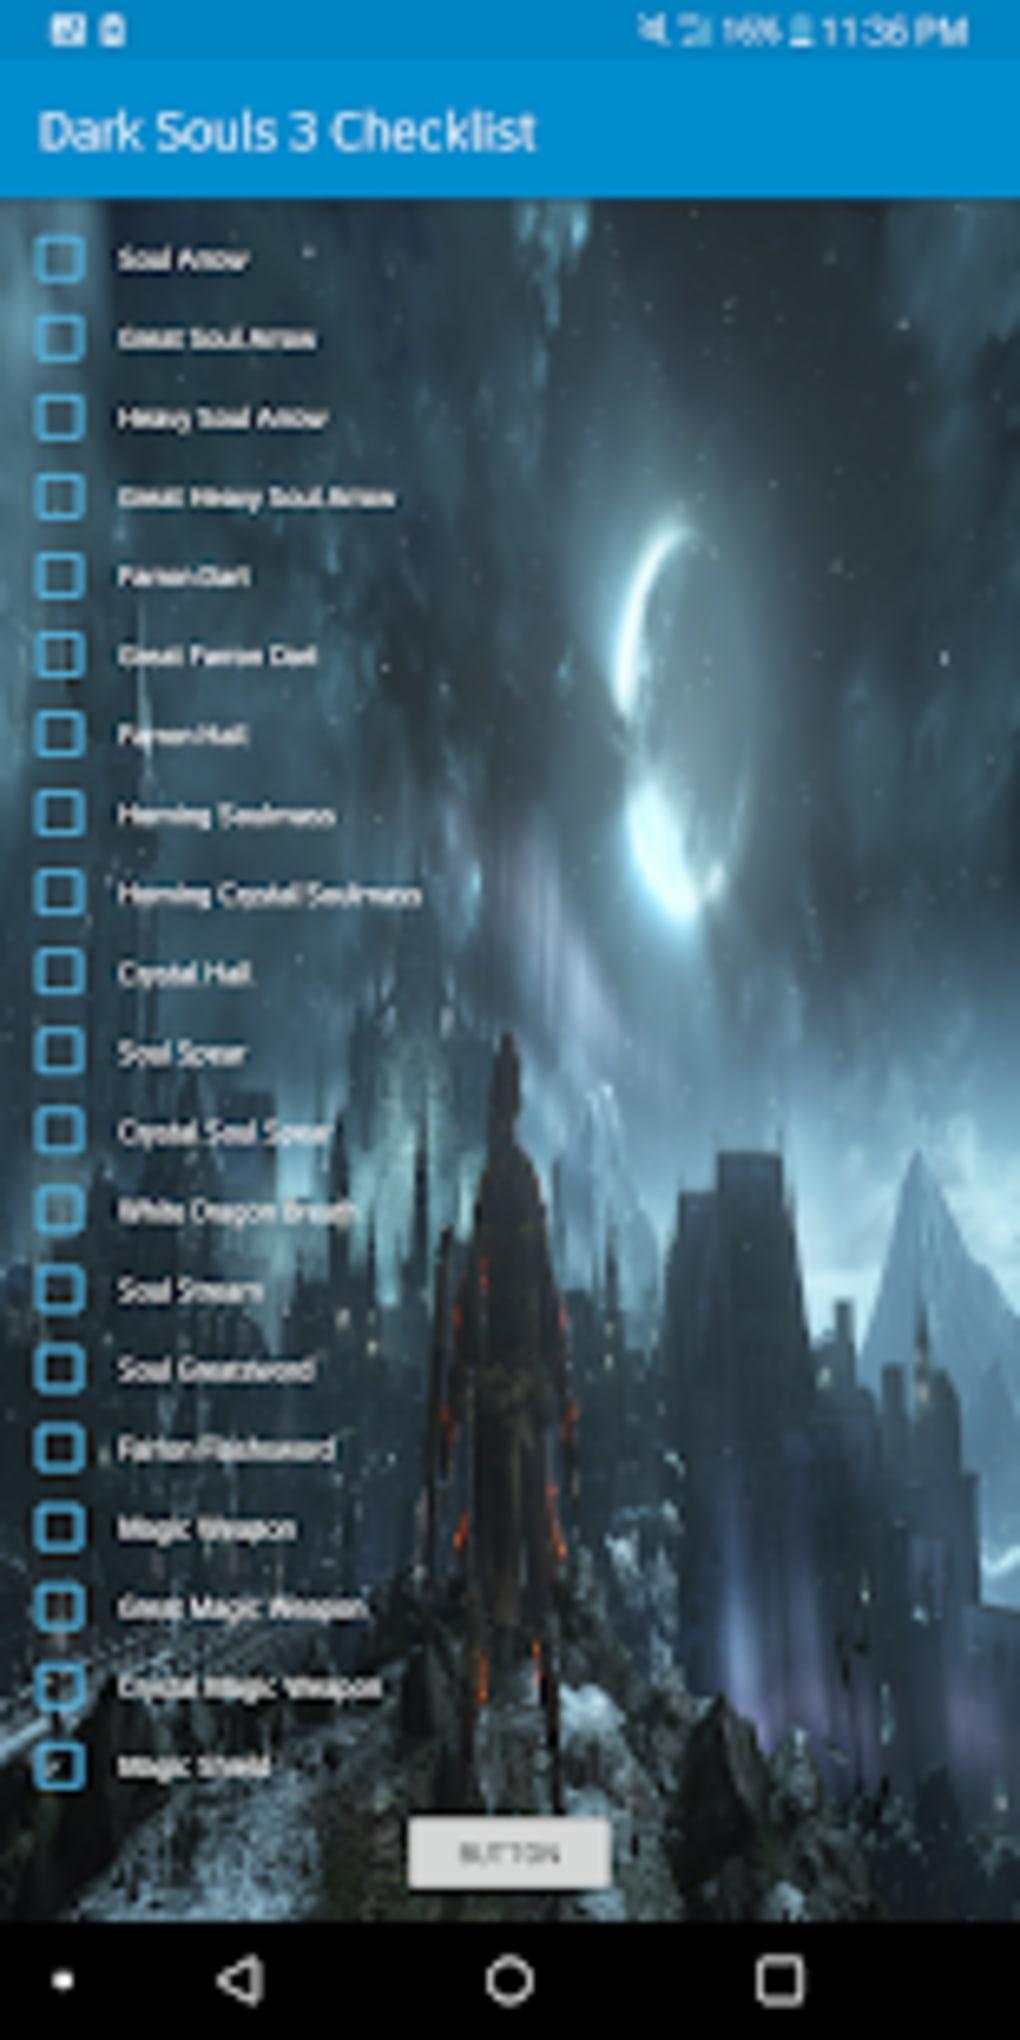 dark souls 3 pc game download